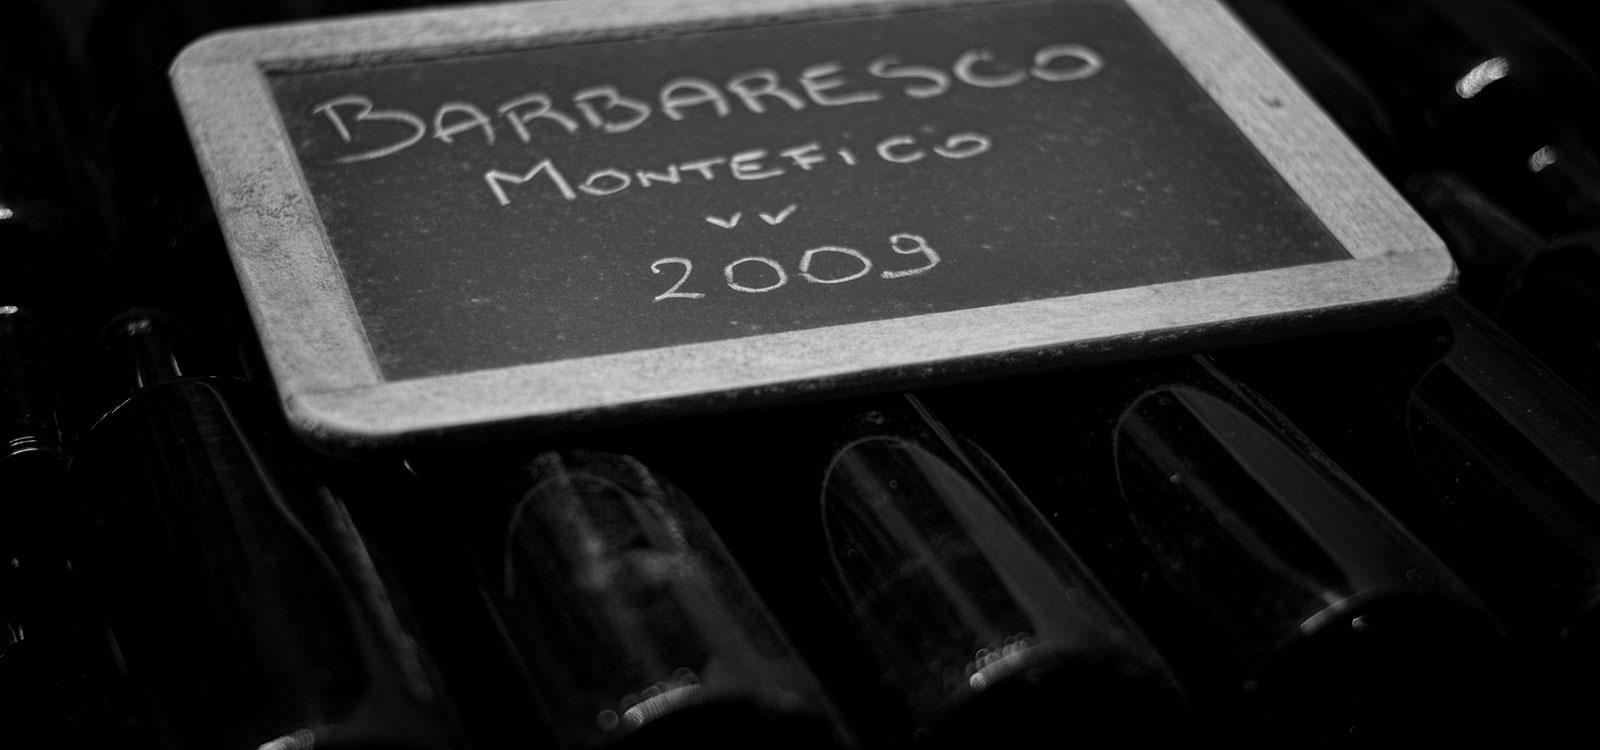 Barbaresco Montefico Vecchie Viti